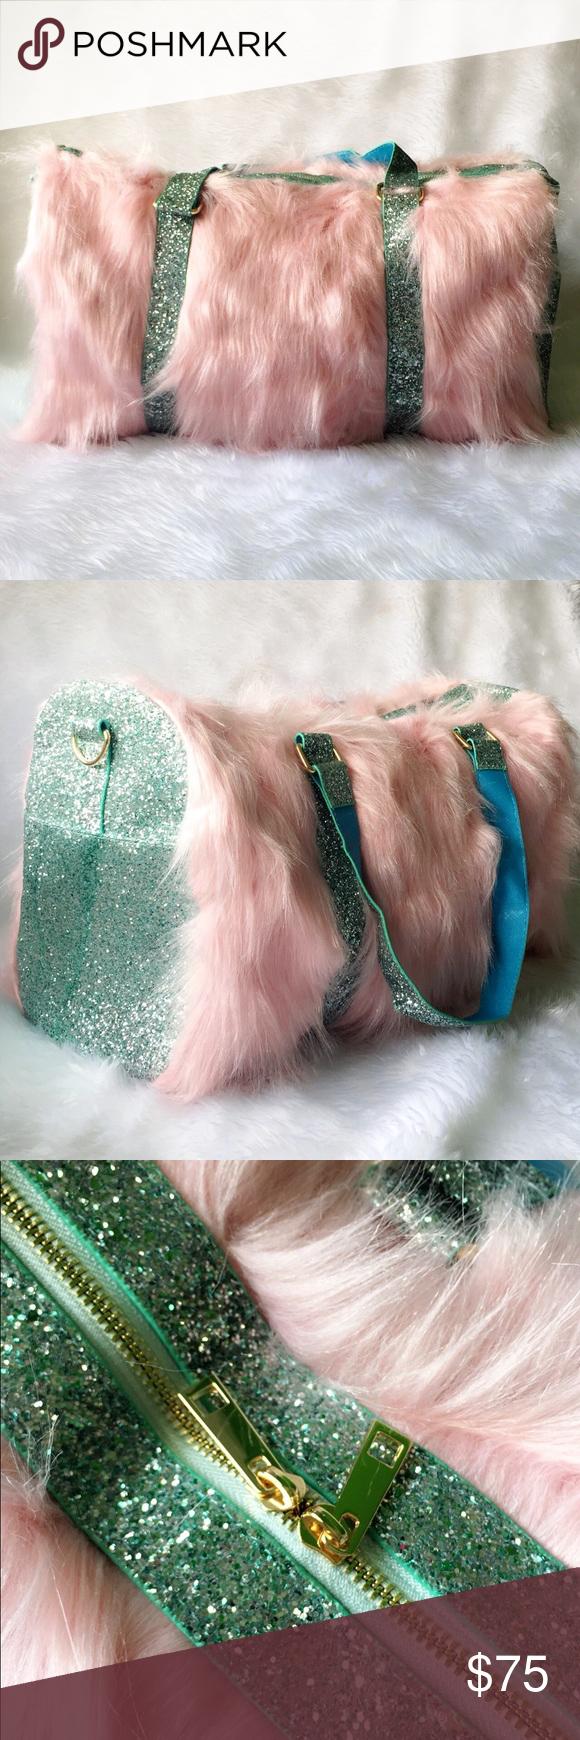 Glitter Unicorn Bag Really soft and glittery bag. Bags